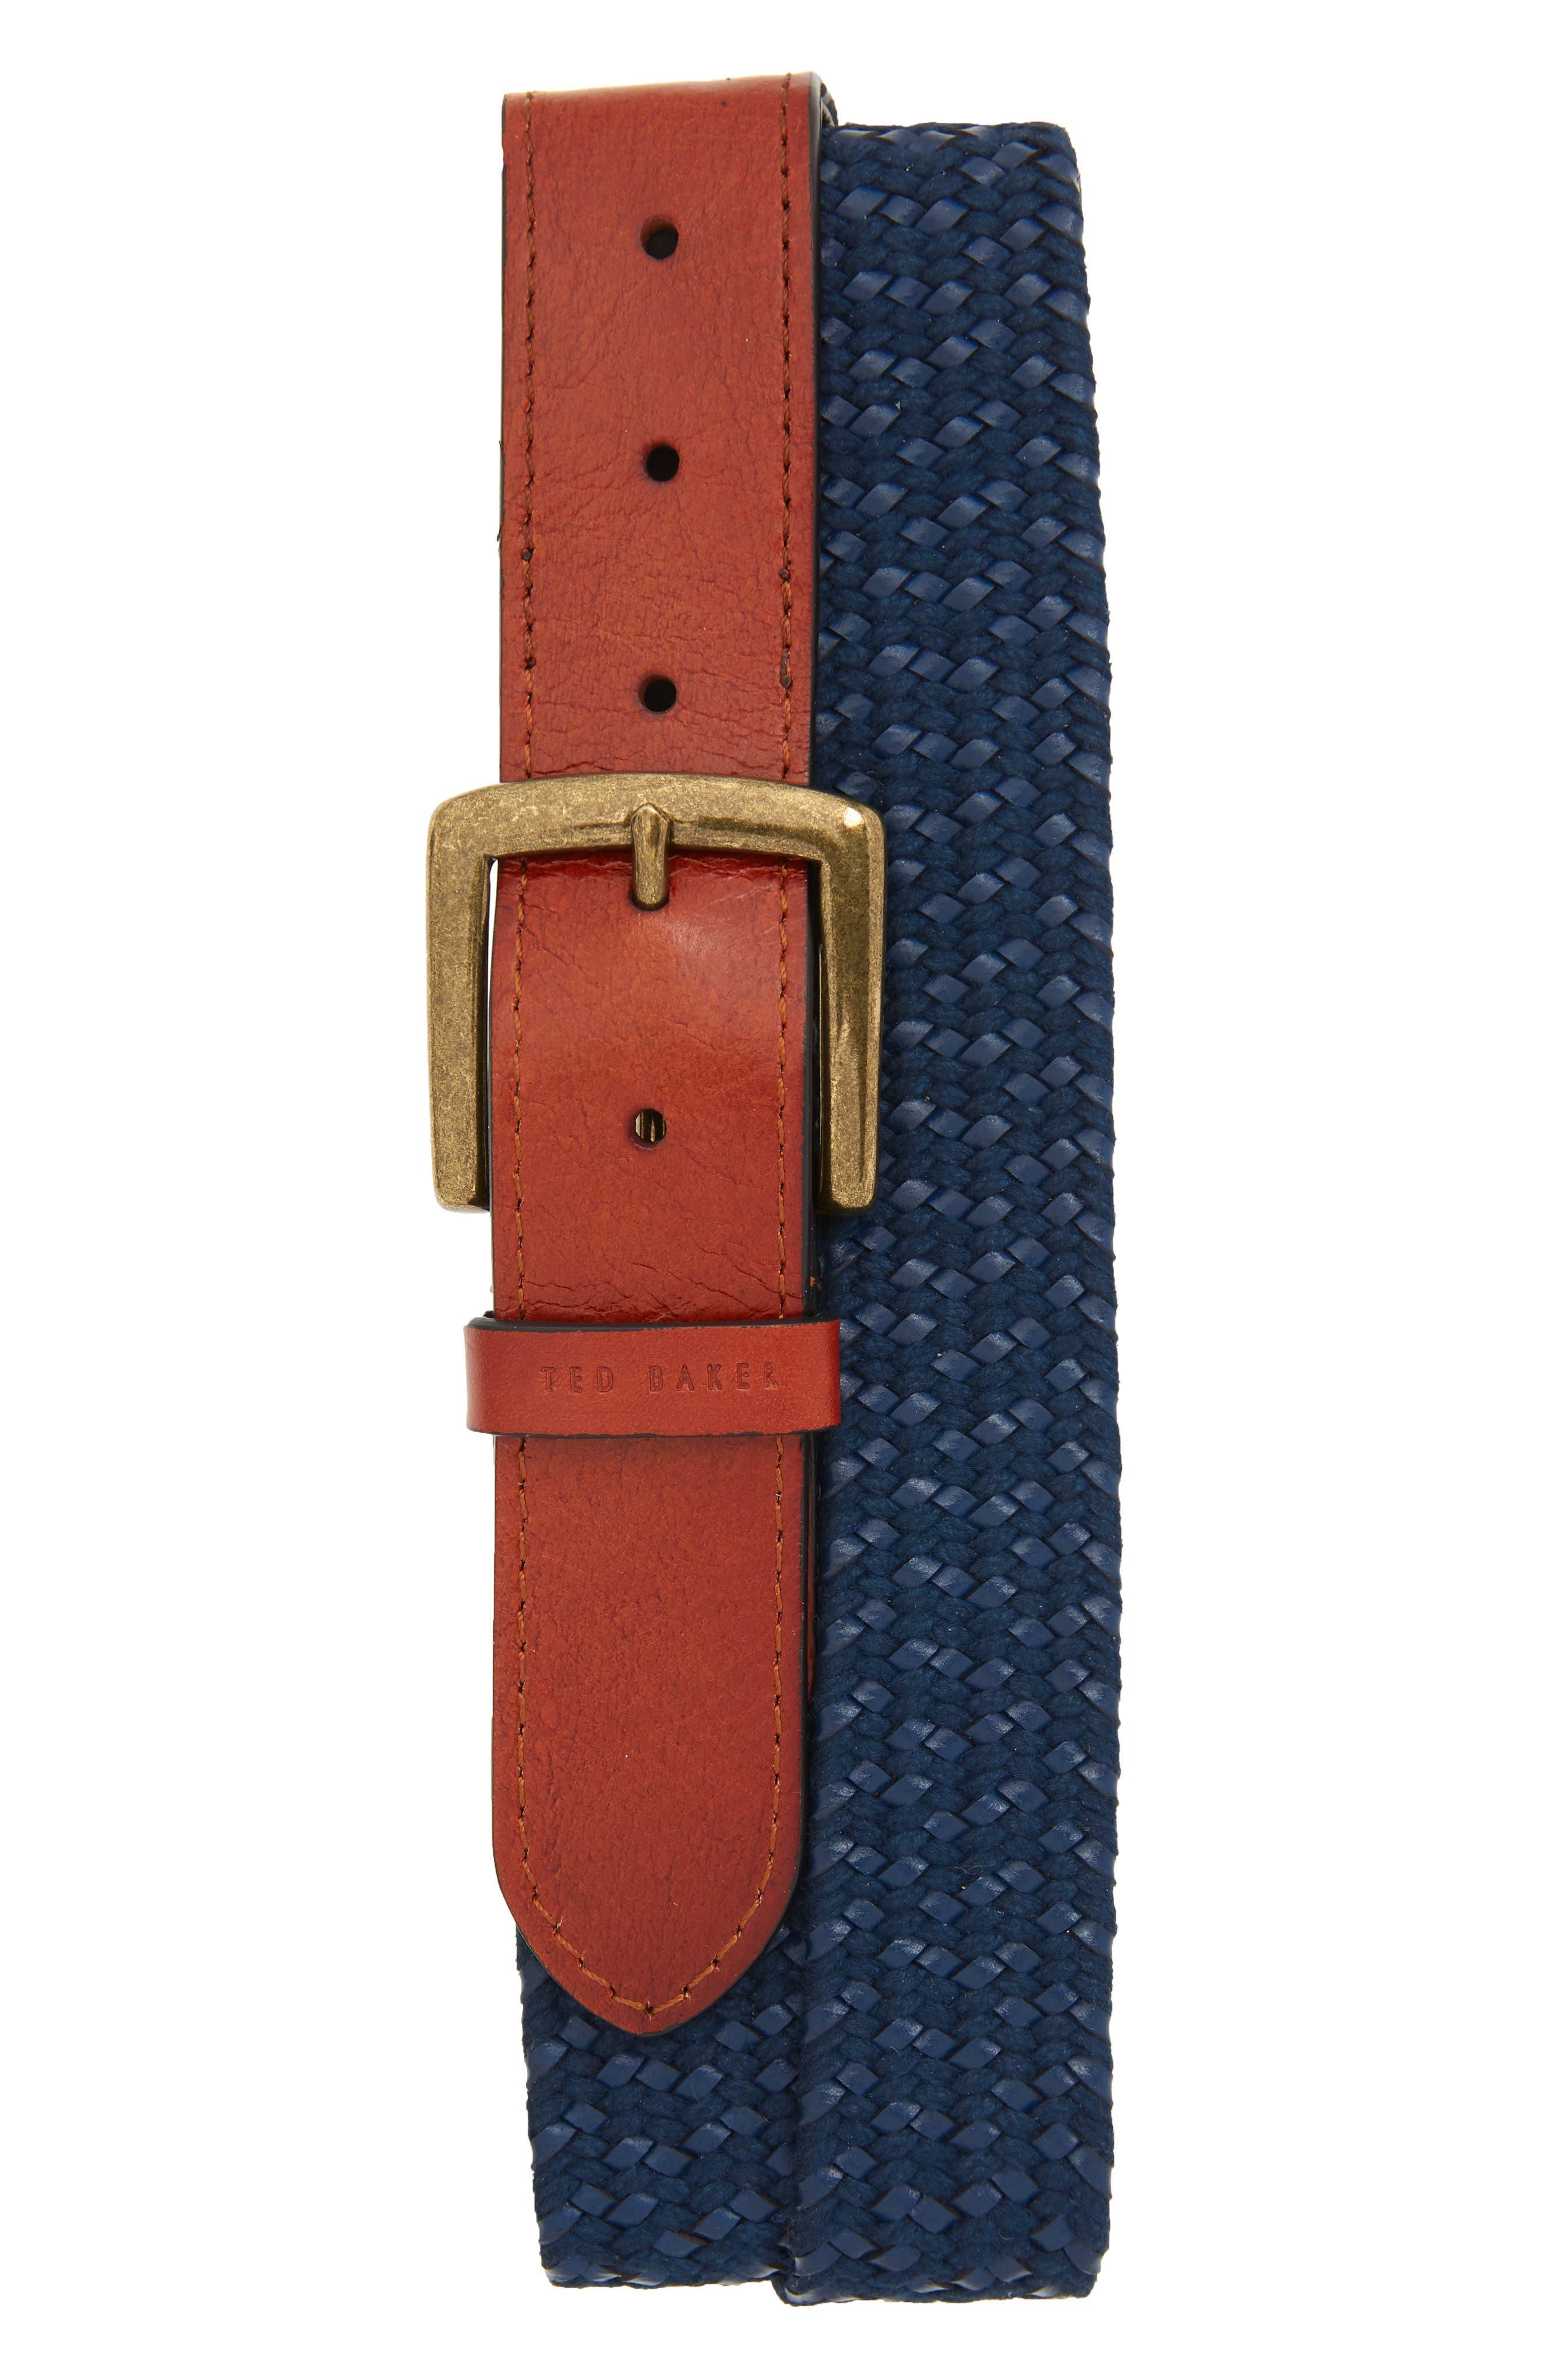 Ted Baker London Woven Leather Belt, Navy